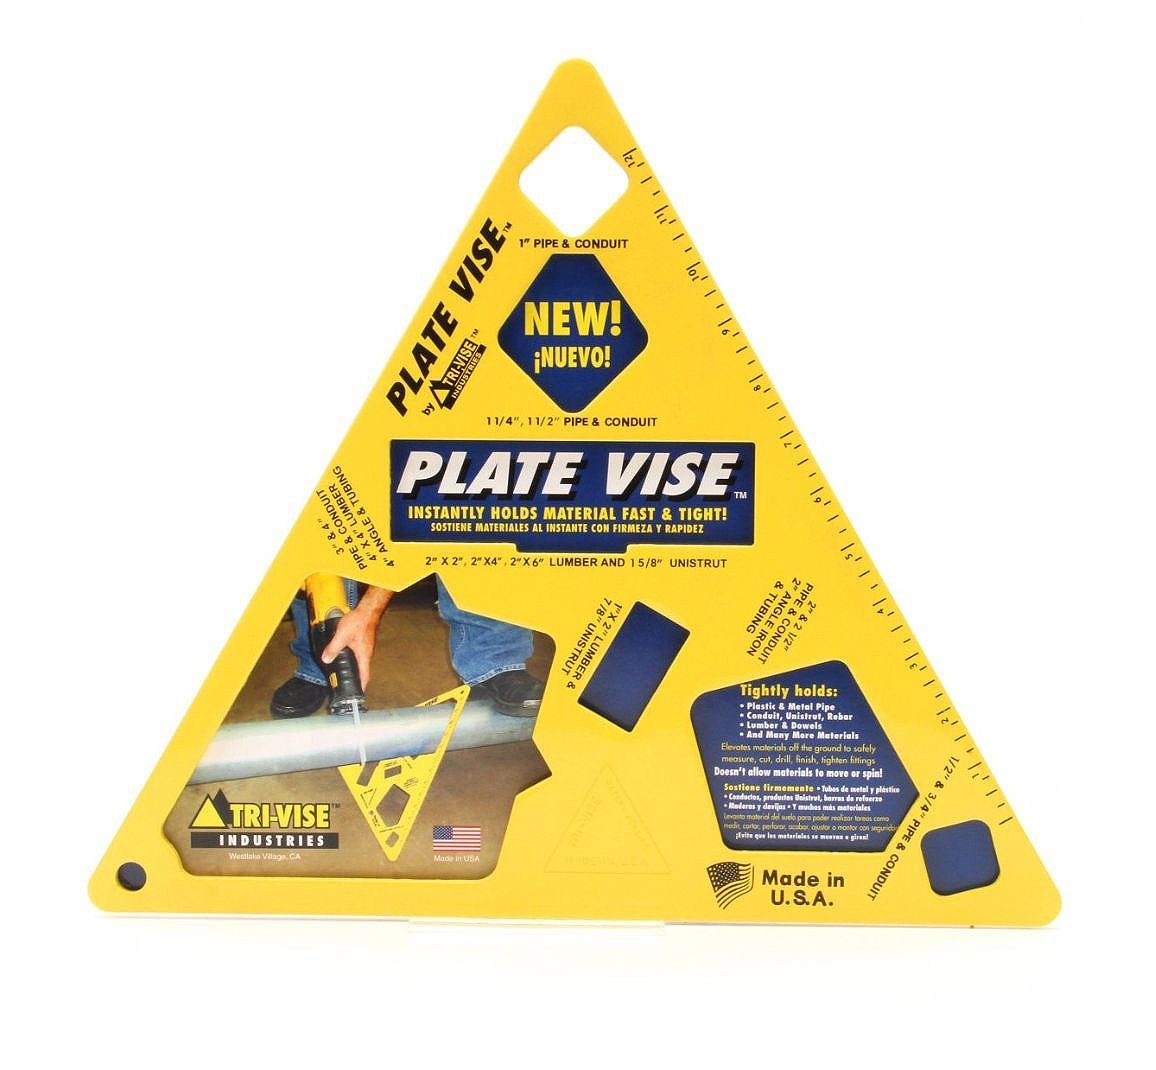 Tri-Vise PVL001 4'' Plate Vise